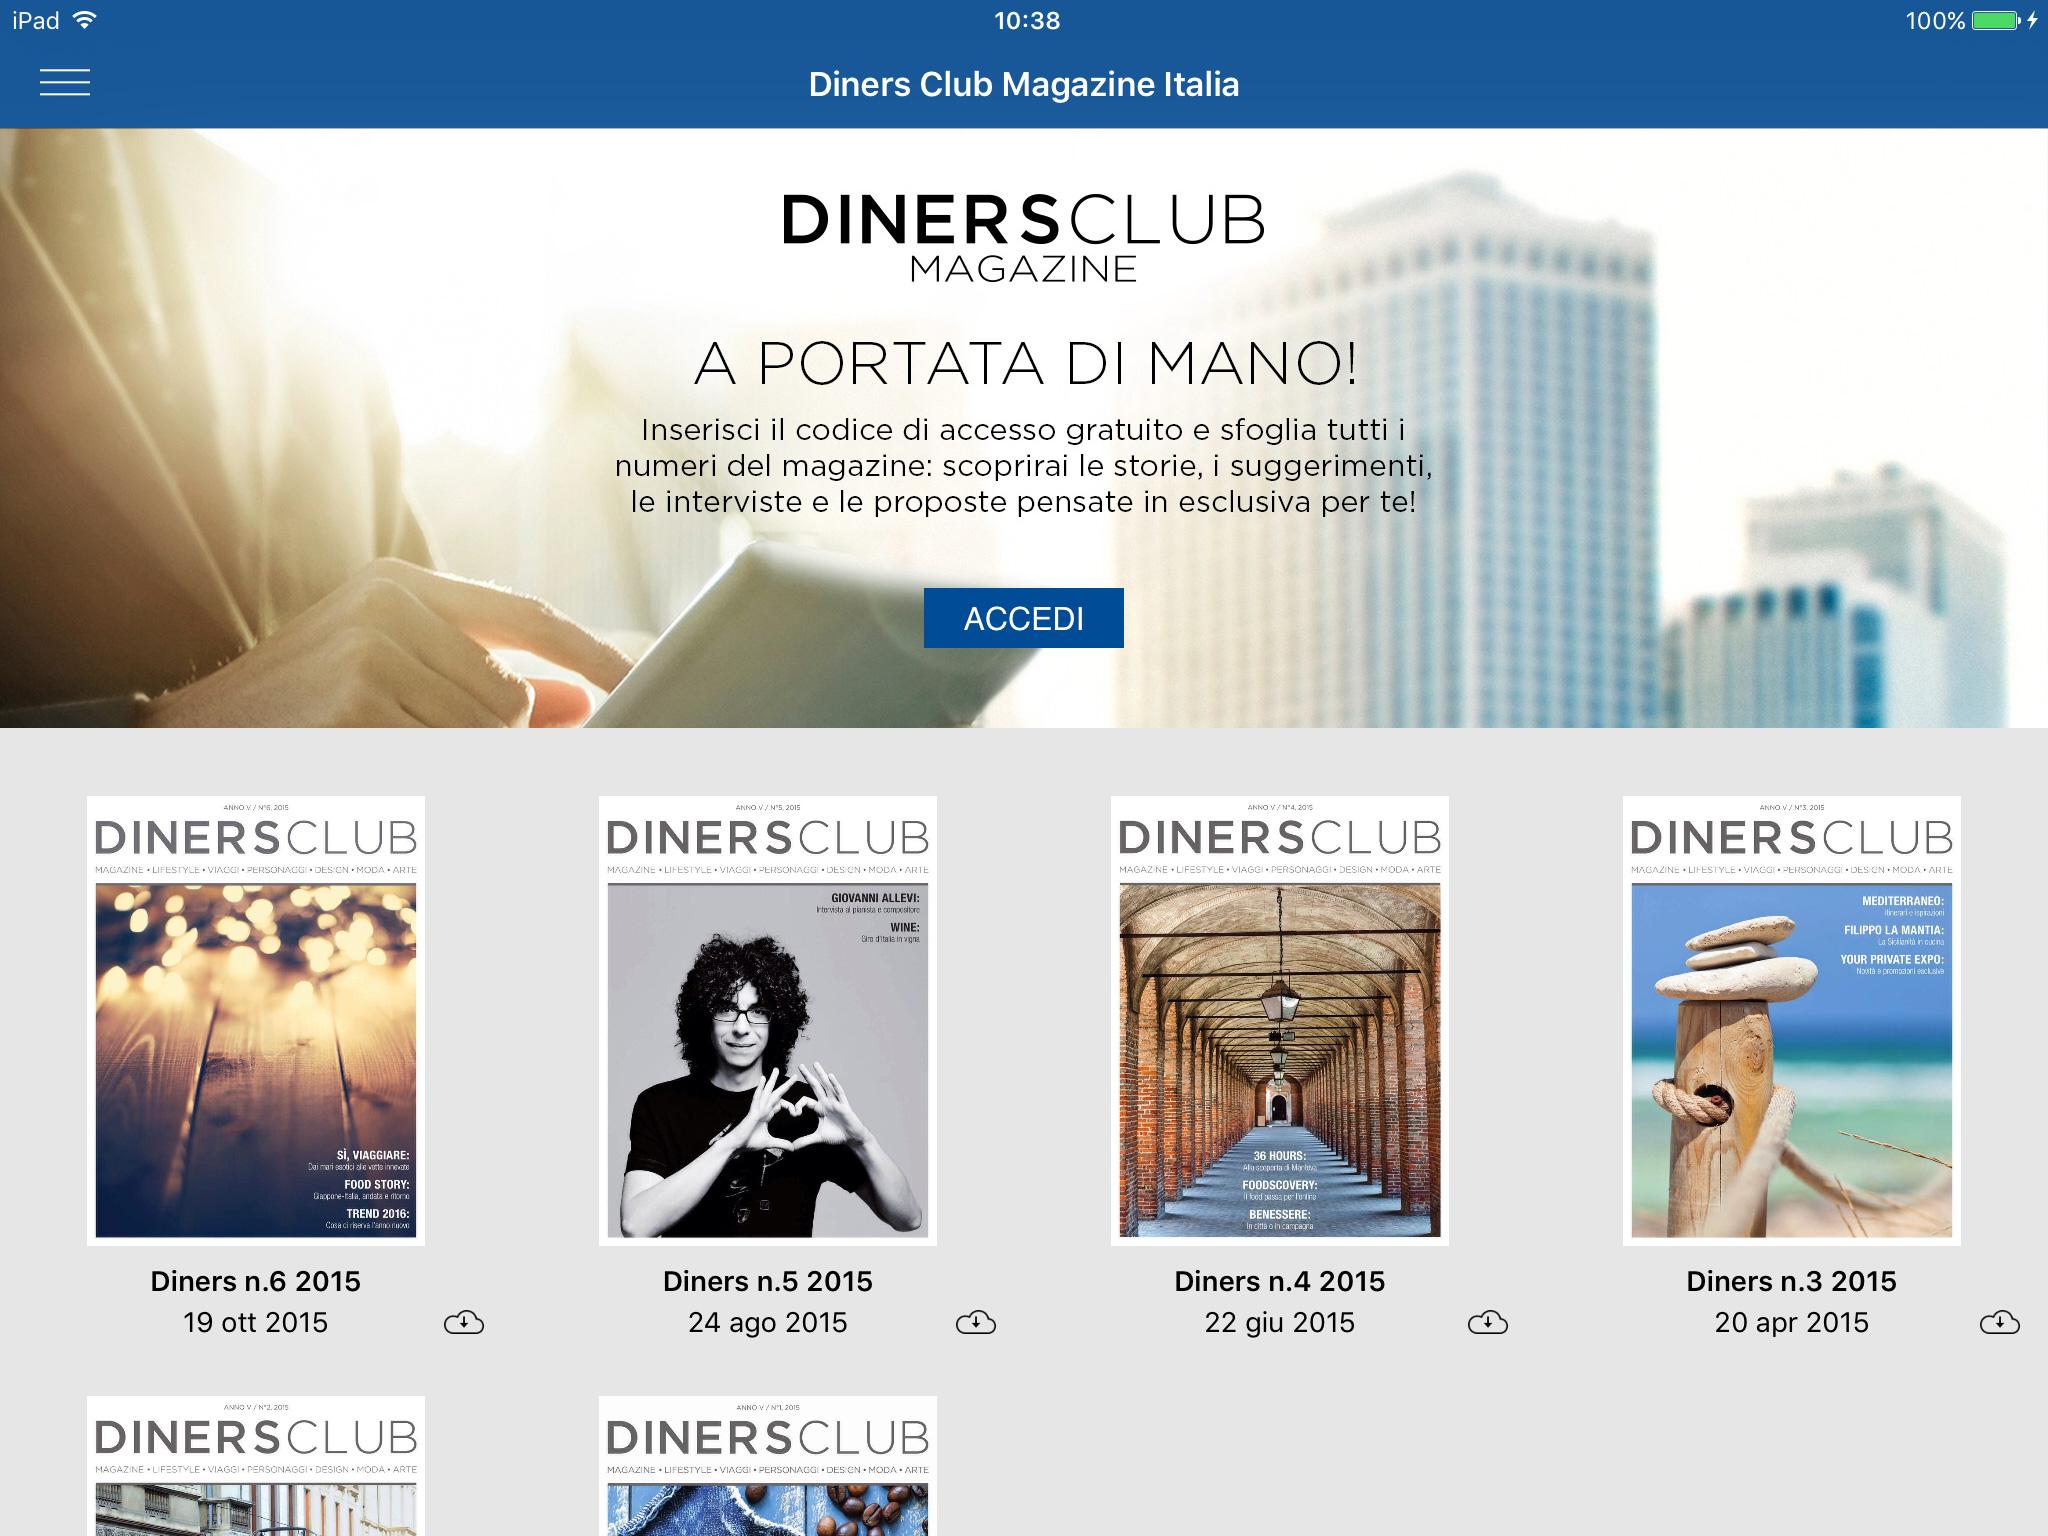 New Diners Club Magazine app